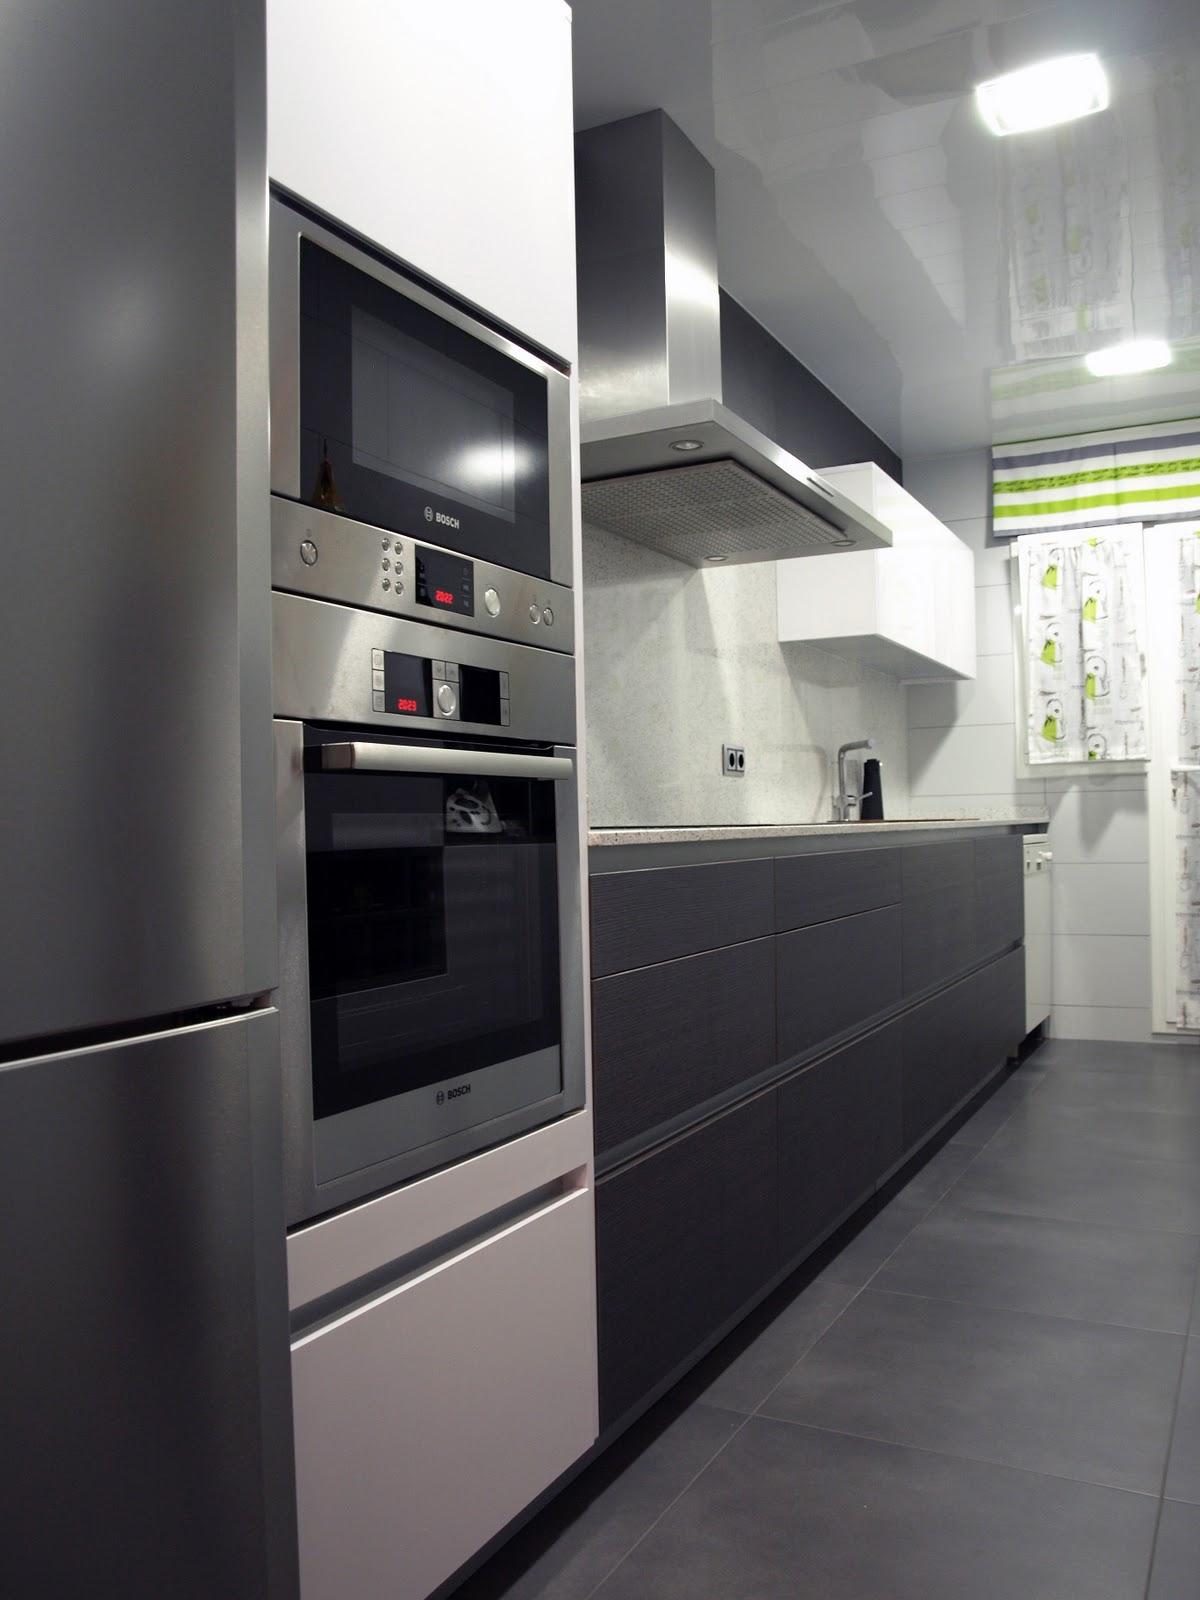 Espai decuina ripollet barcelona septiembre 2011 for Cocinas gris con blanco